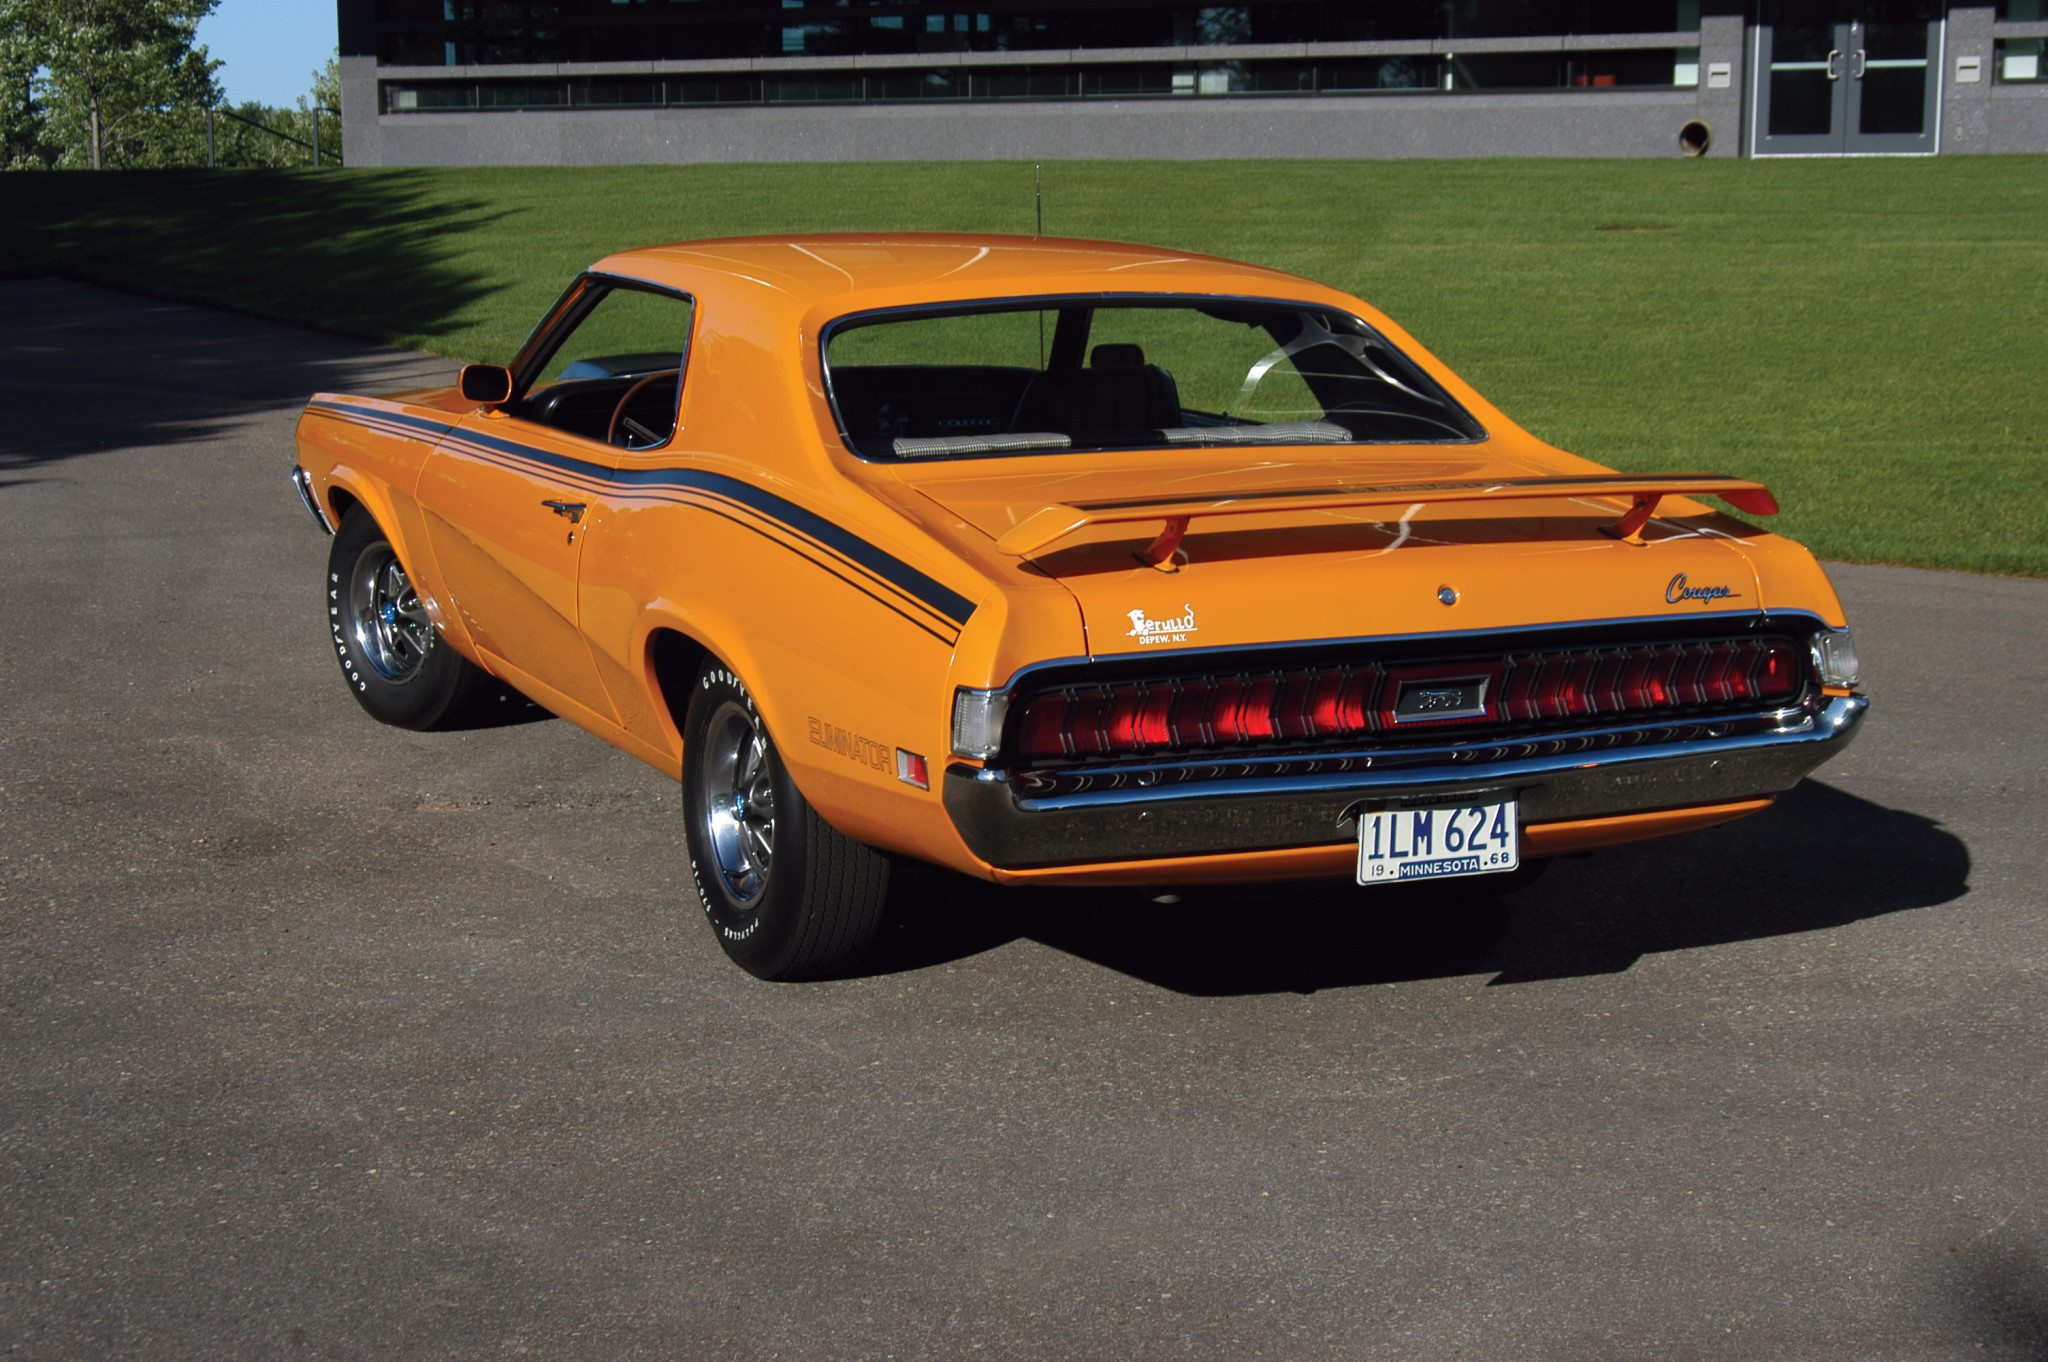 1970 Mercury Cougar Eliminator Rear